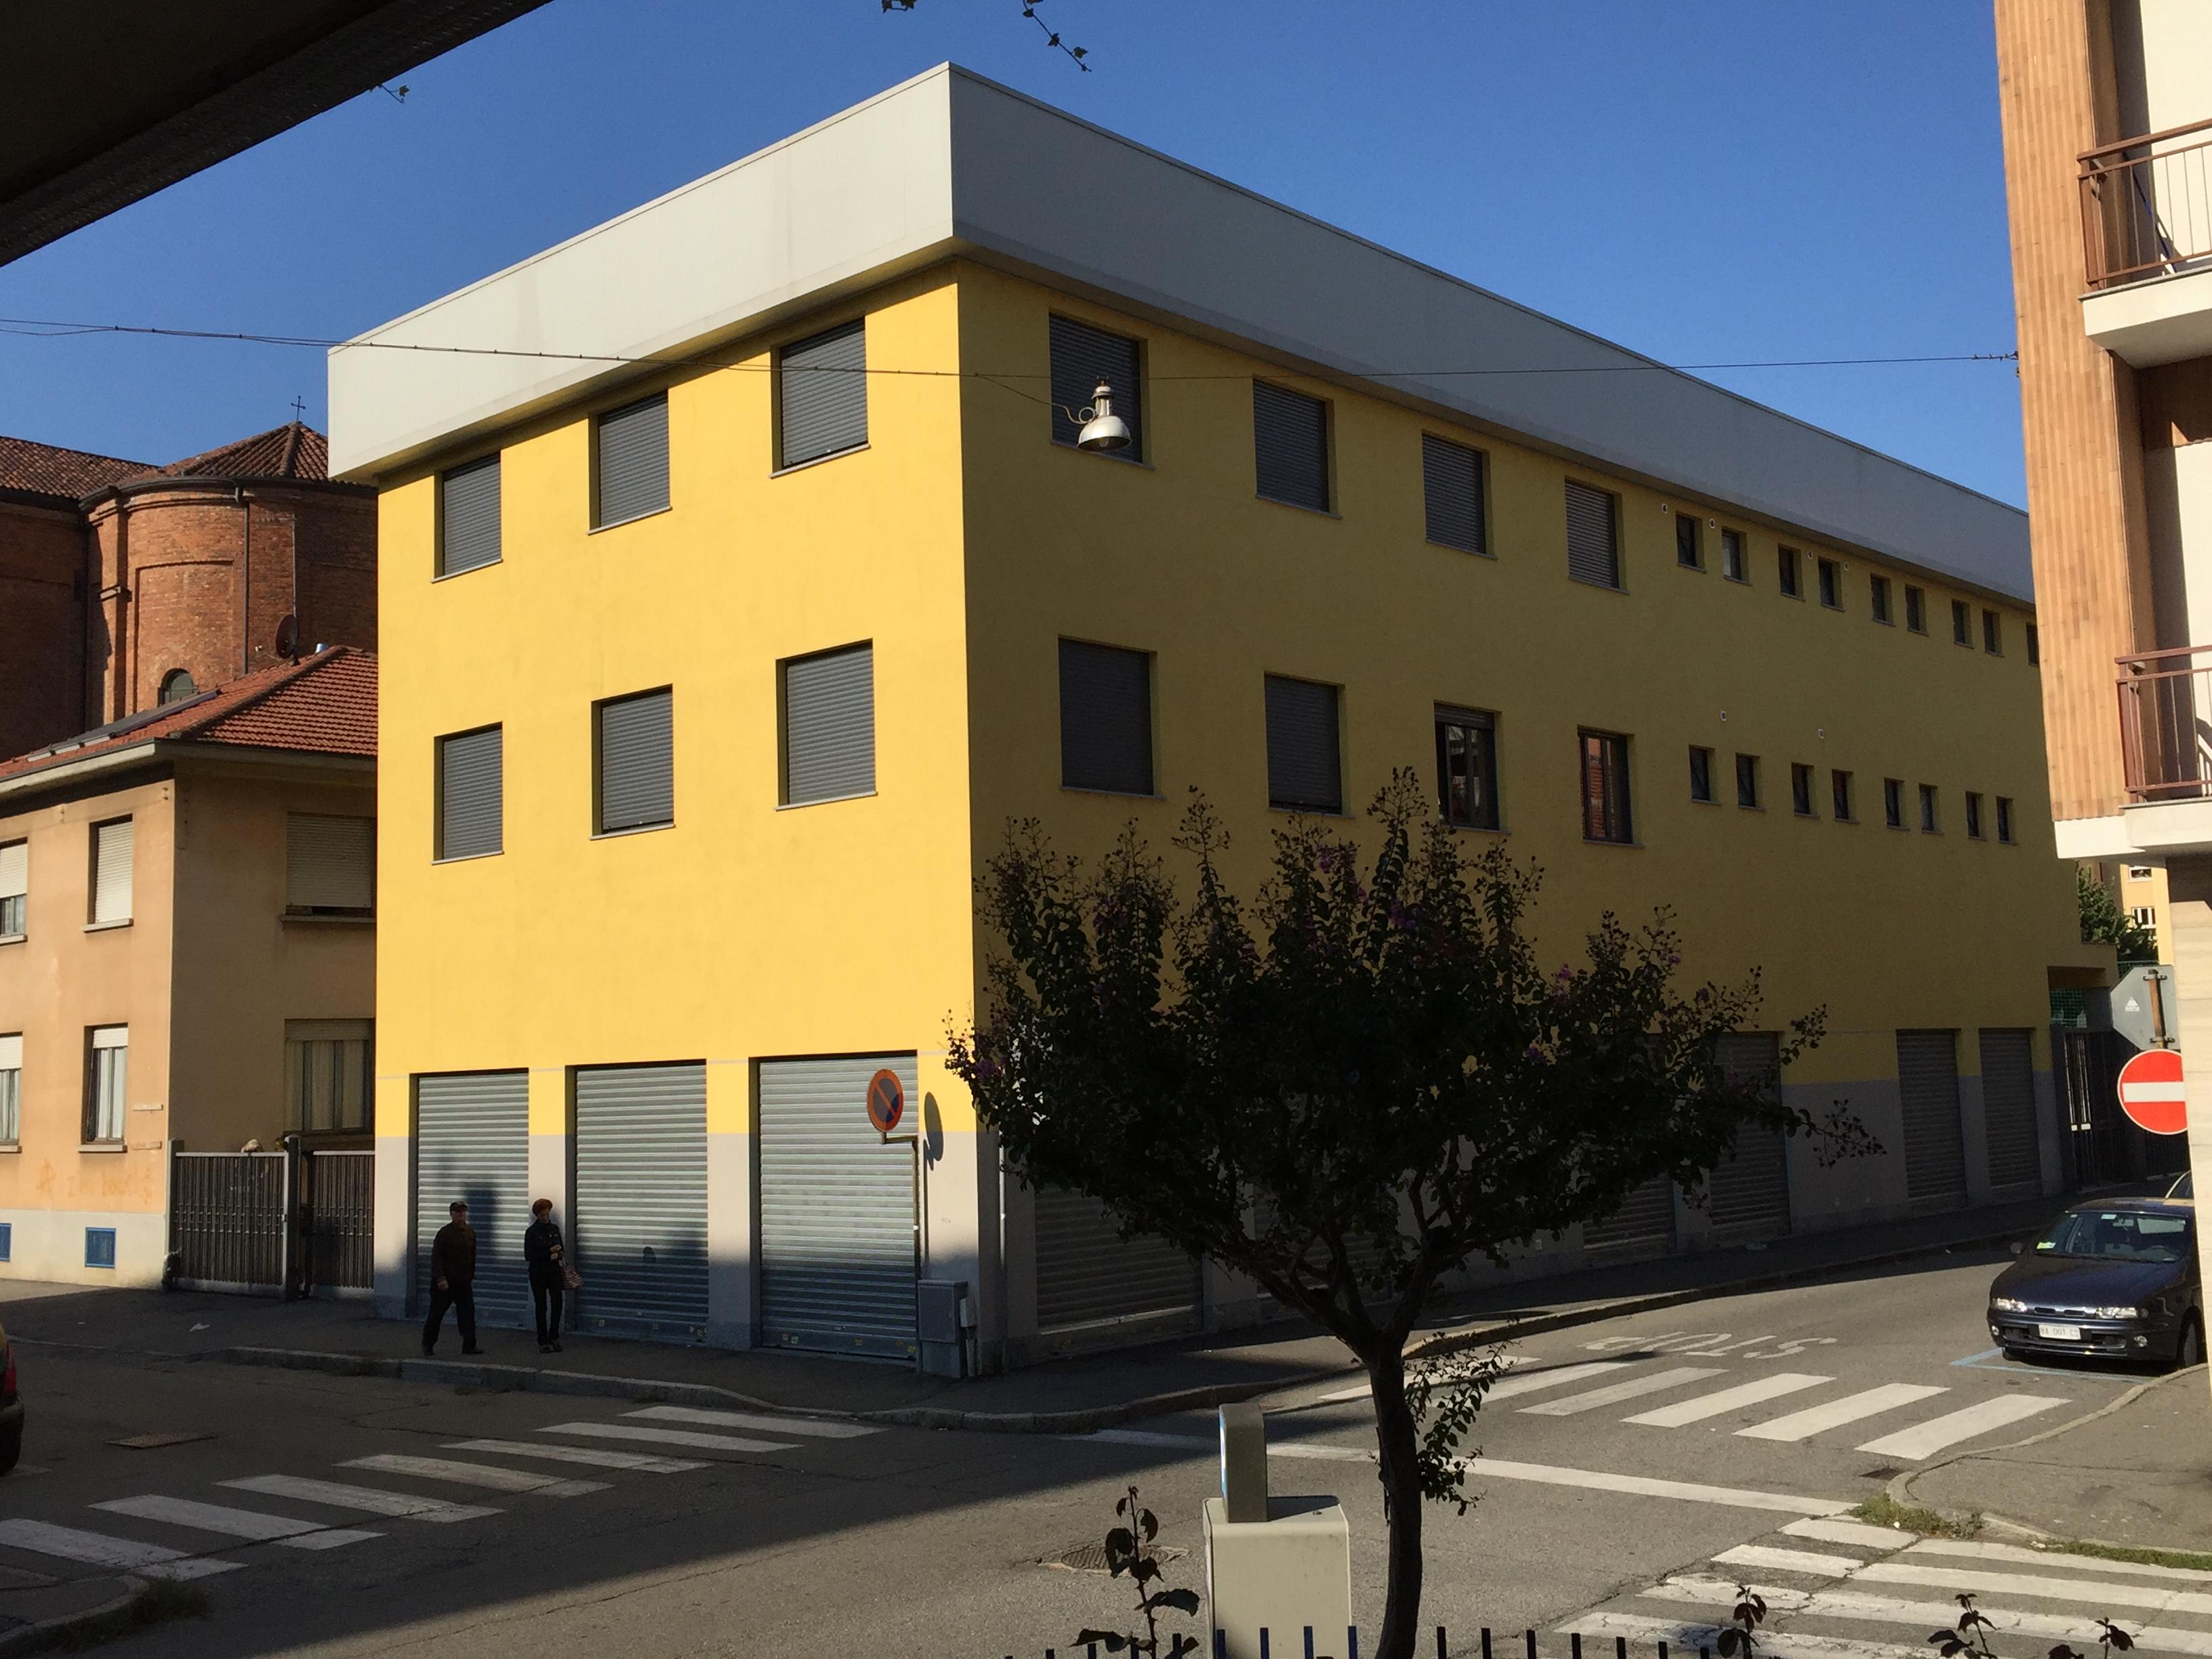 Terziario industriale demarchi costruzioni - Agenzie immobiliari bucarest ...